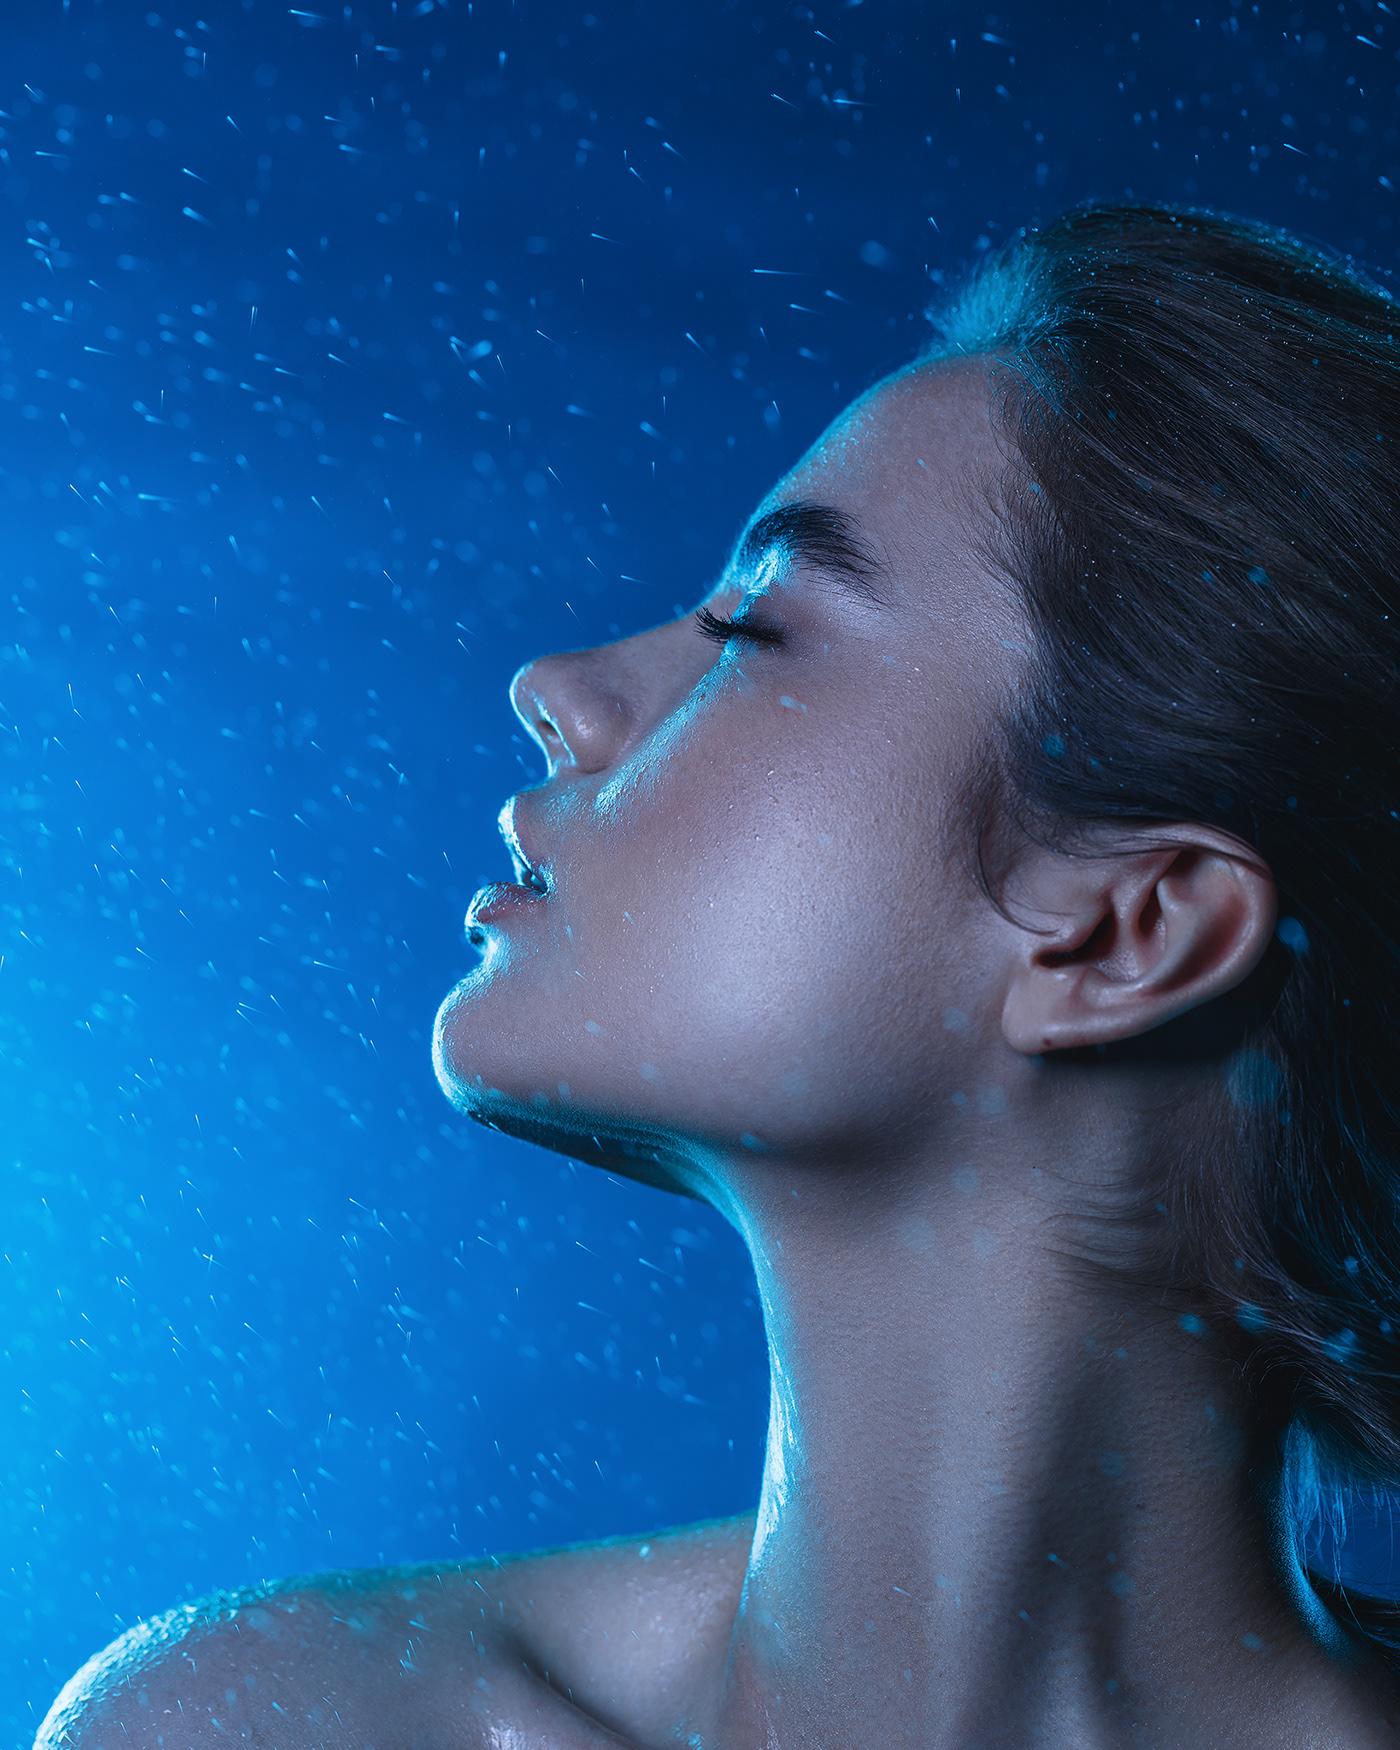 beauty portrait editorial retouch beauty photography beauty retouch beauty editorial Fashion  water aqua